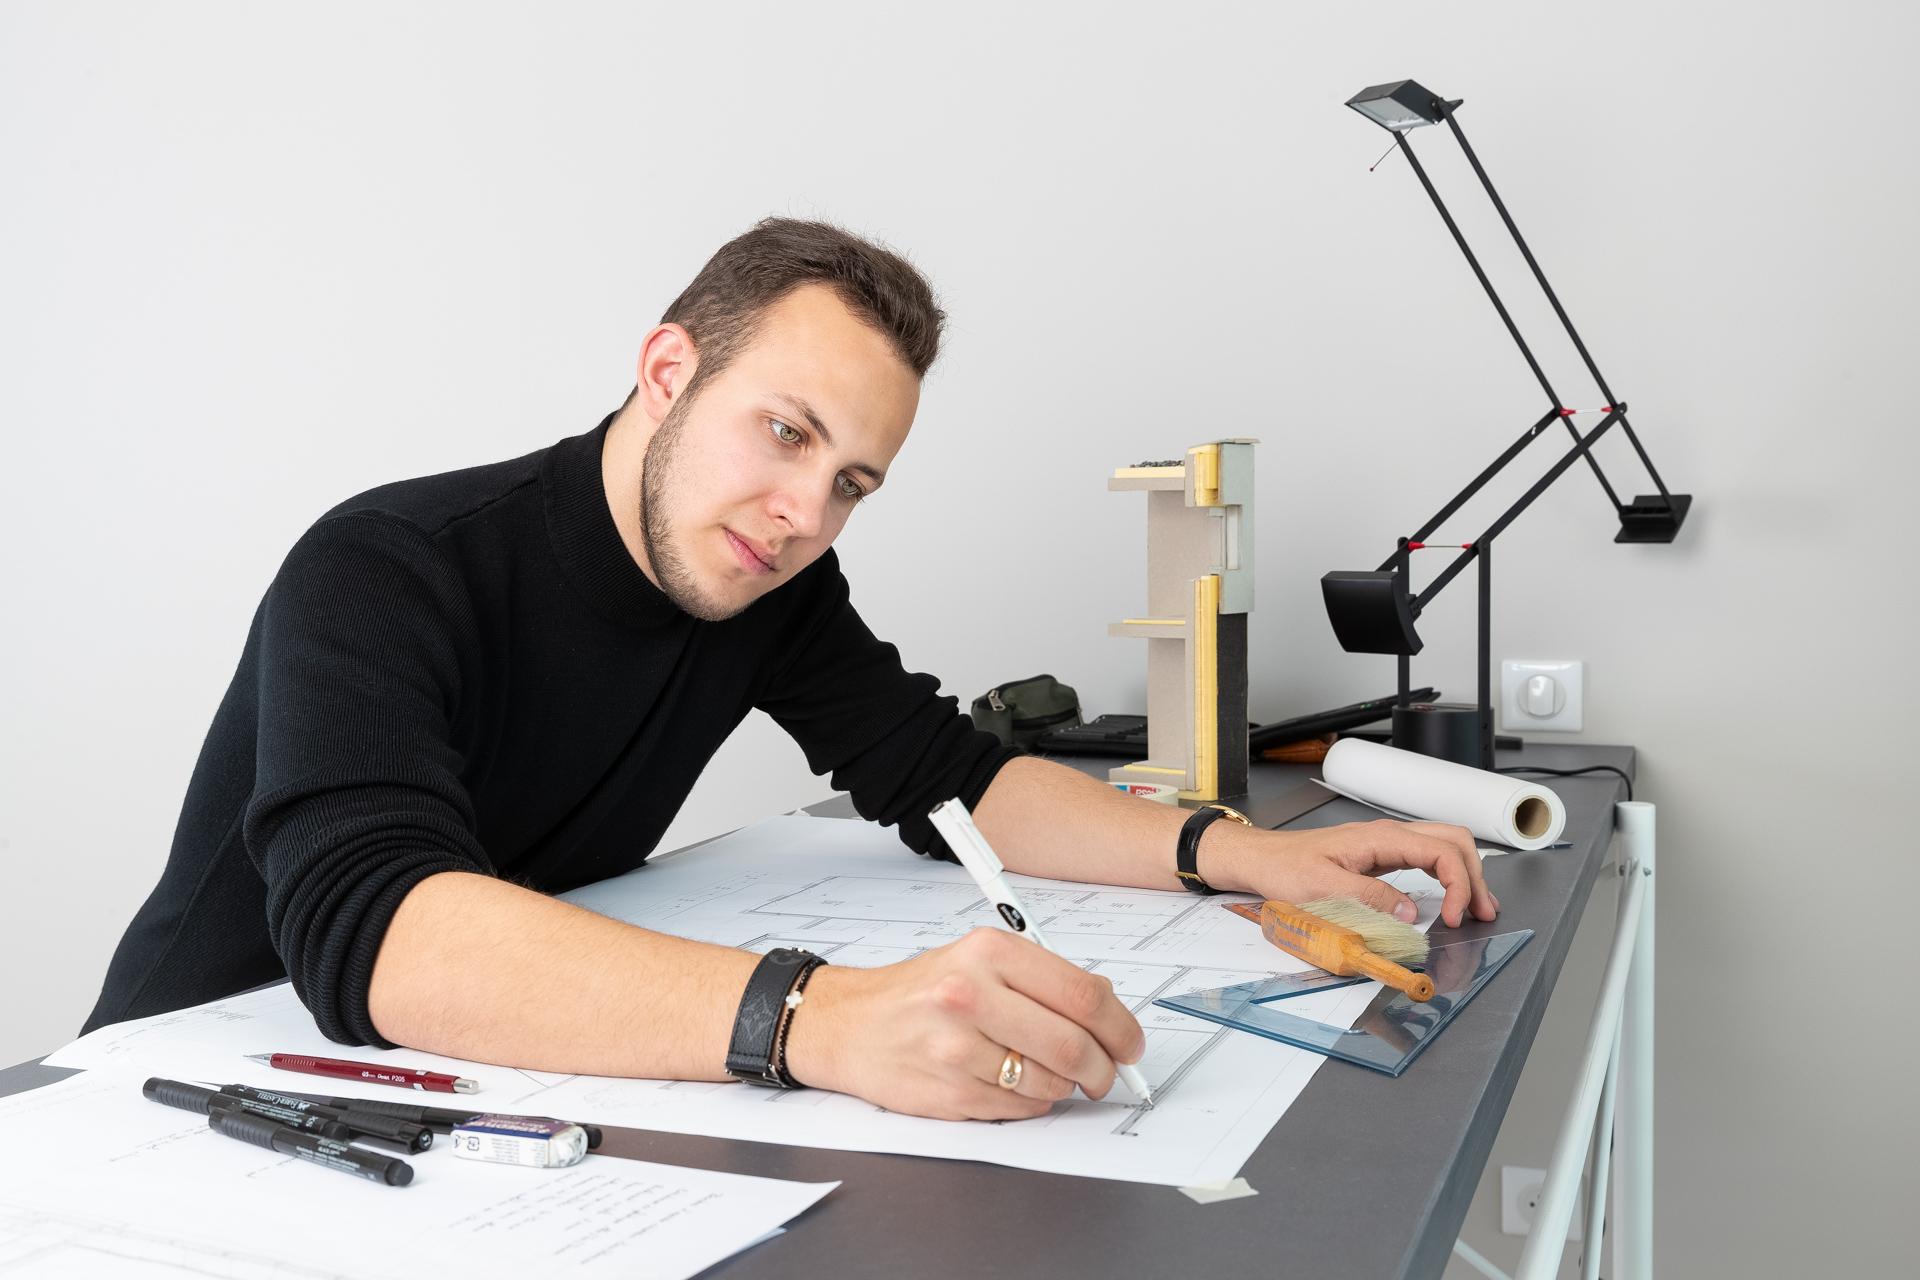 Arno, futur architecte